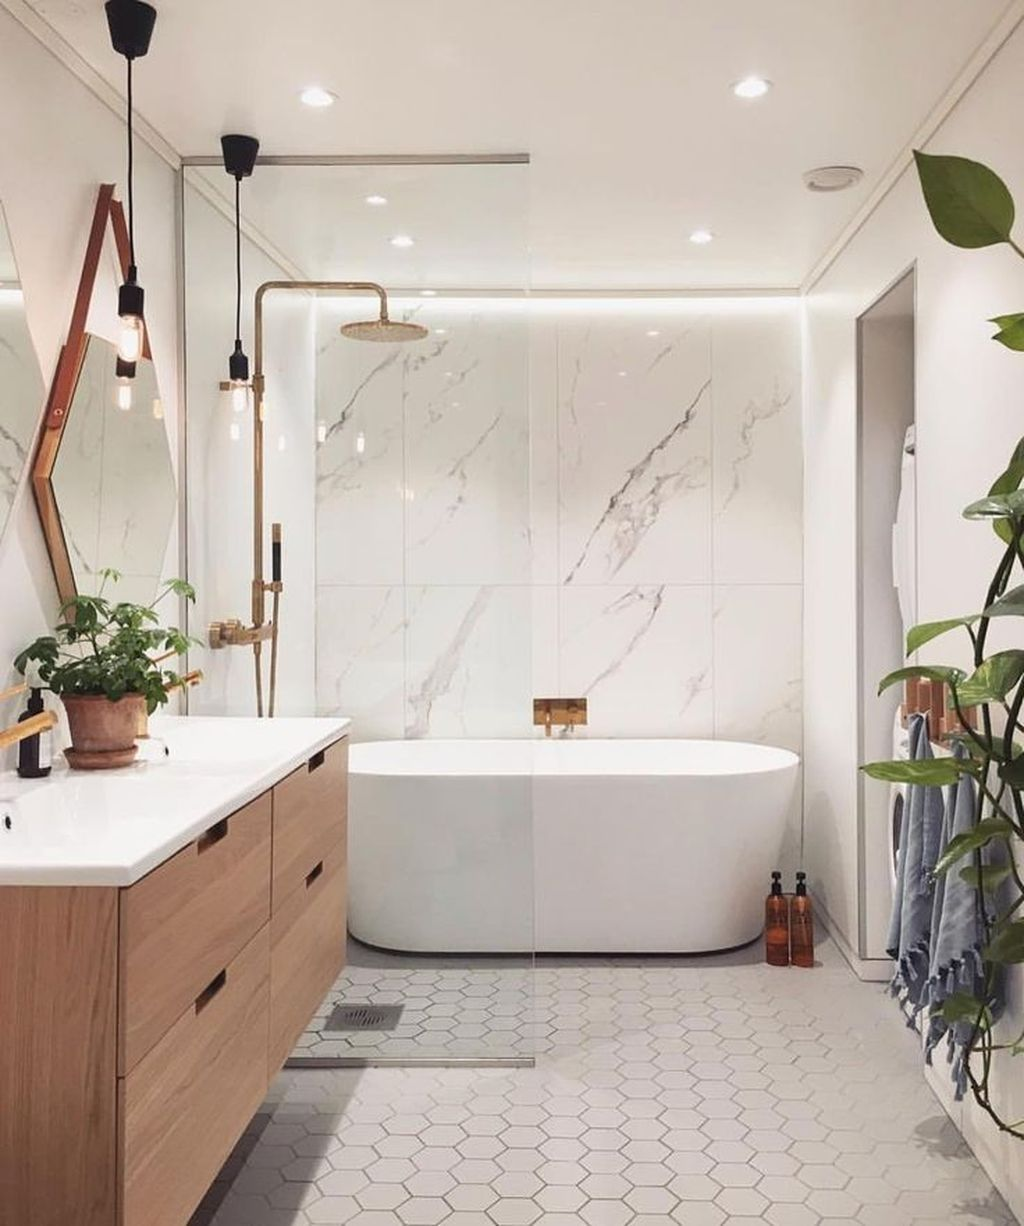 30 Excellent Bathroom Design Ideas You Should Have Master